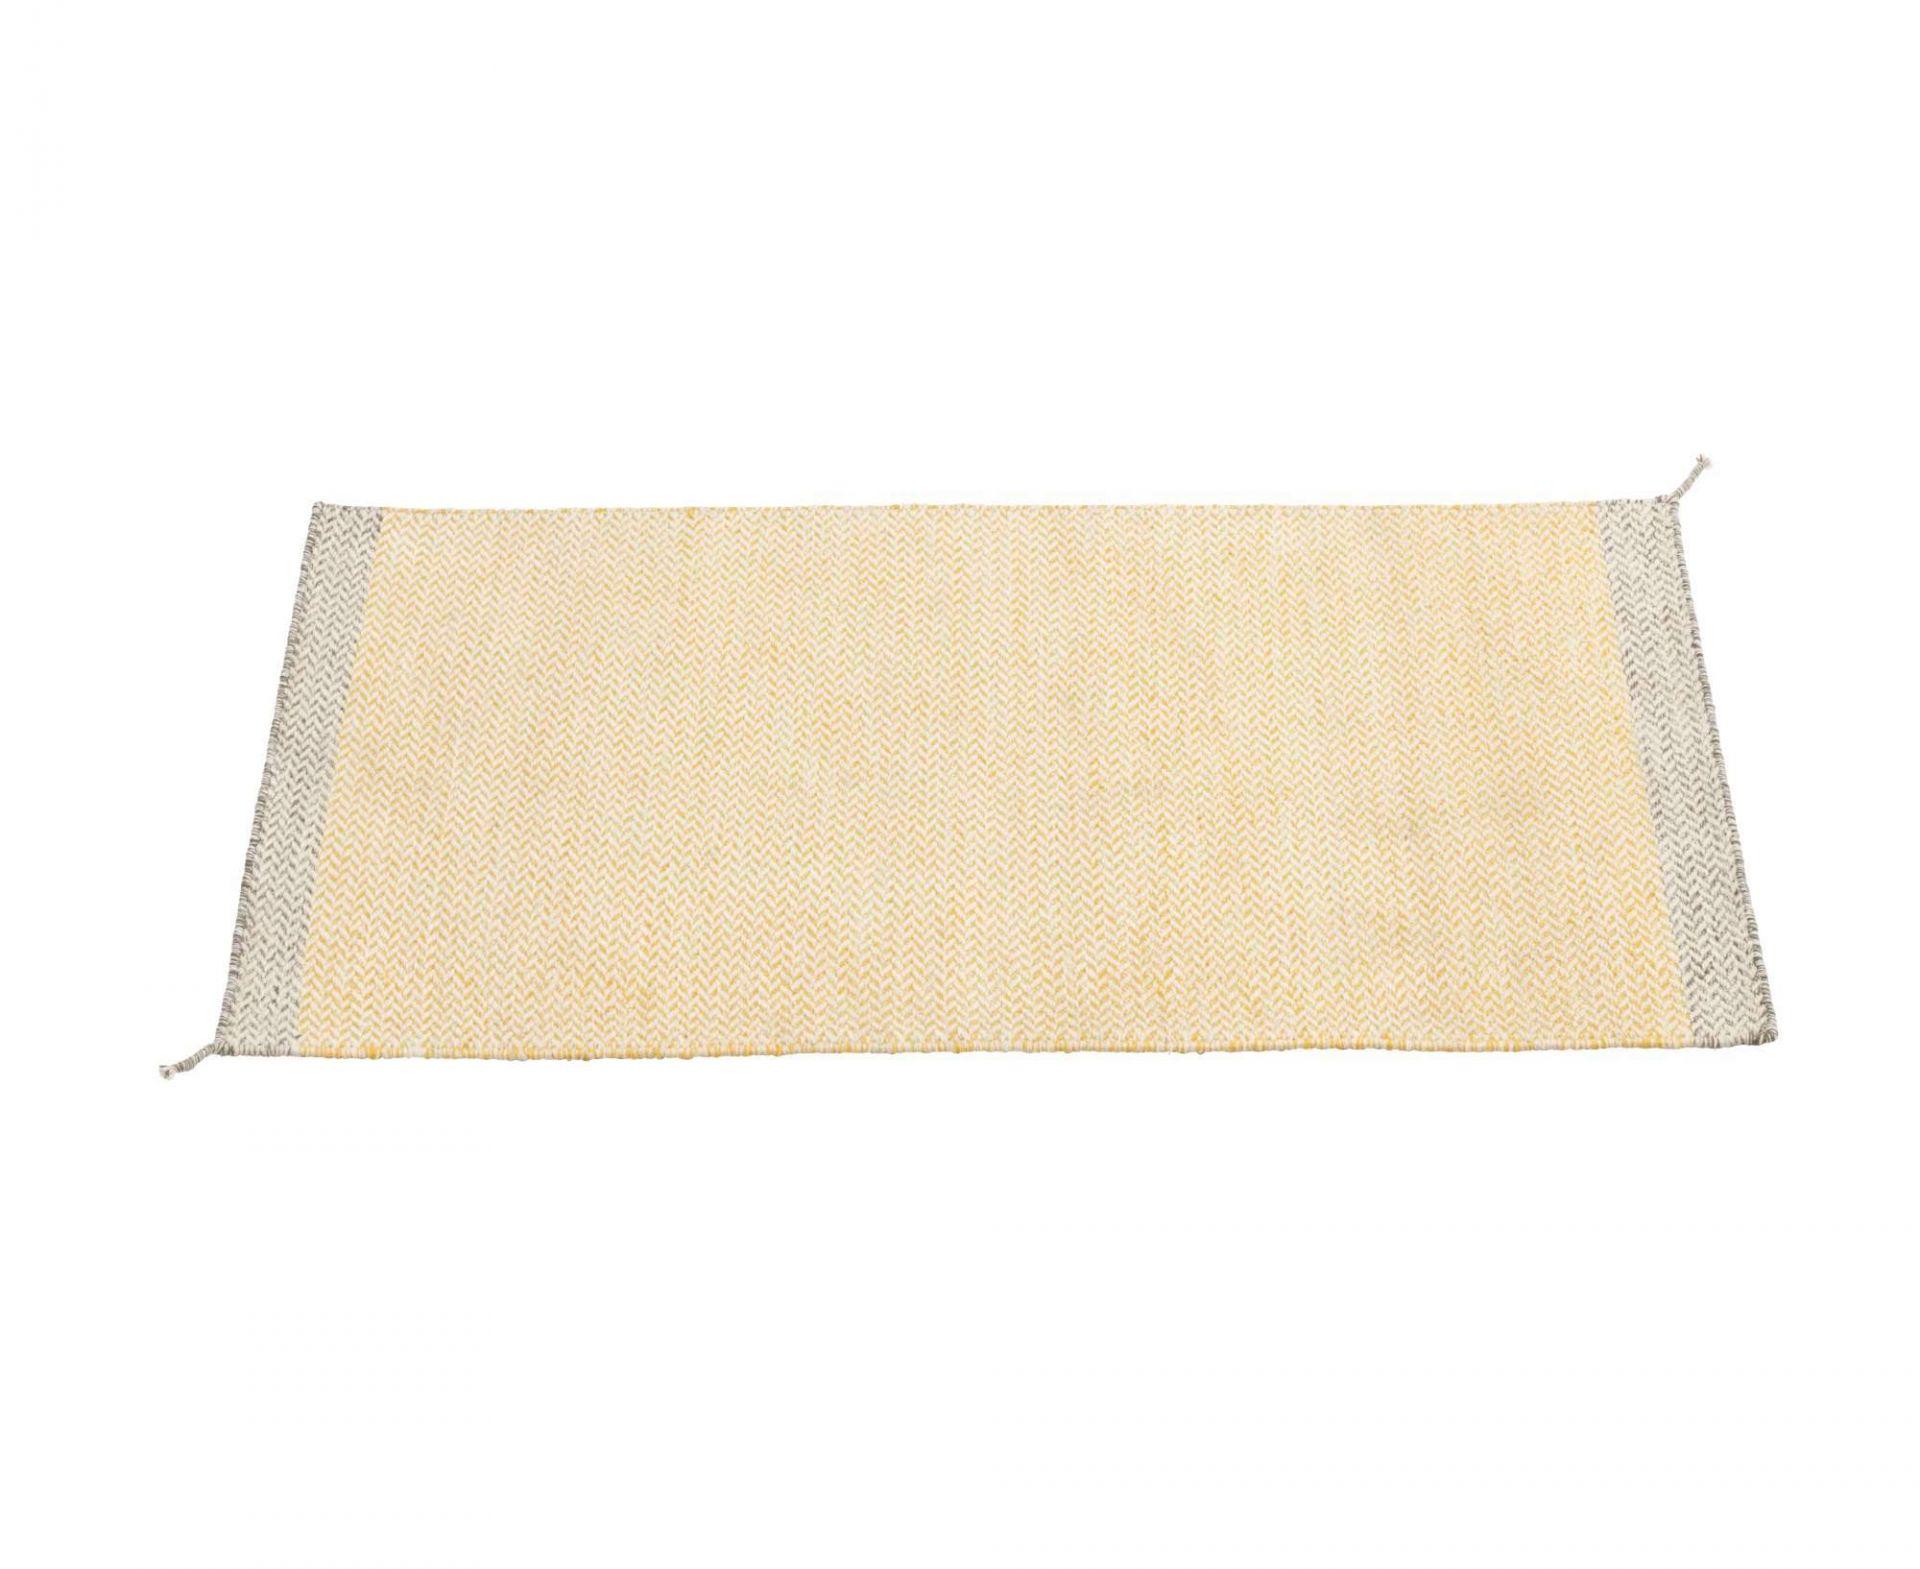 Ply Rug Teppich 85 x 140 cm Muuto-Gelb